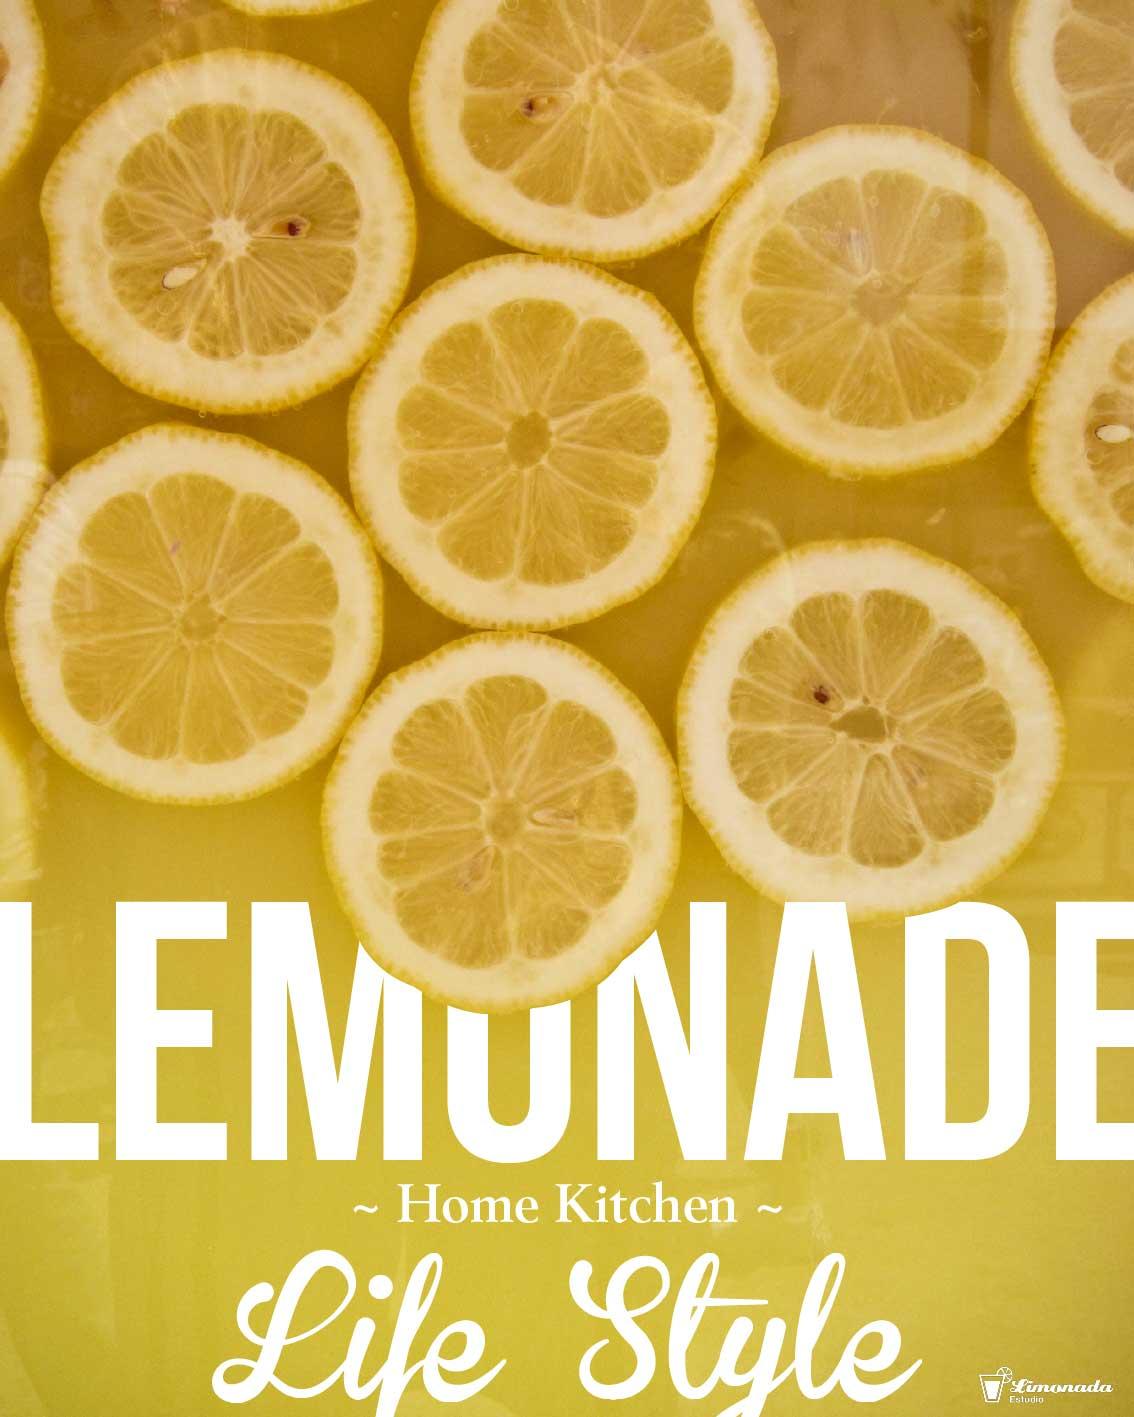 2 - Lemonade Home Kitchen Life Style